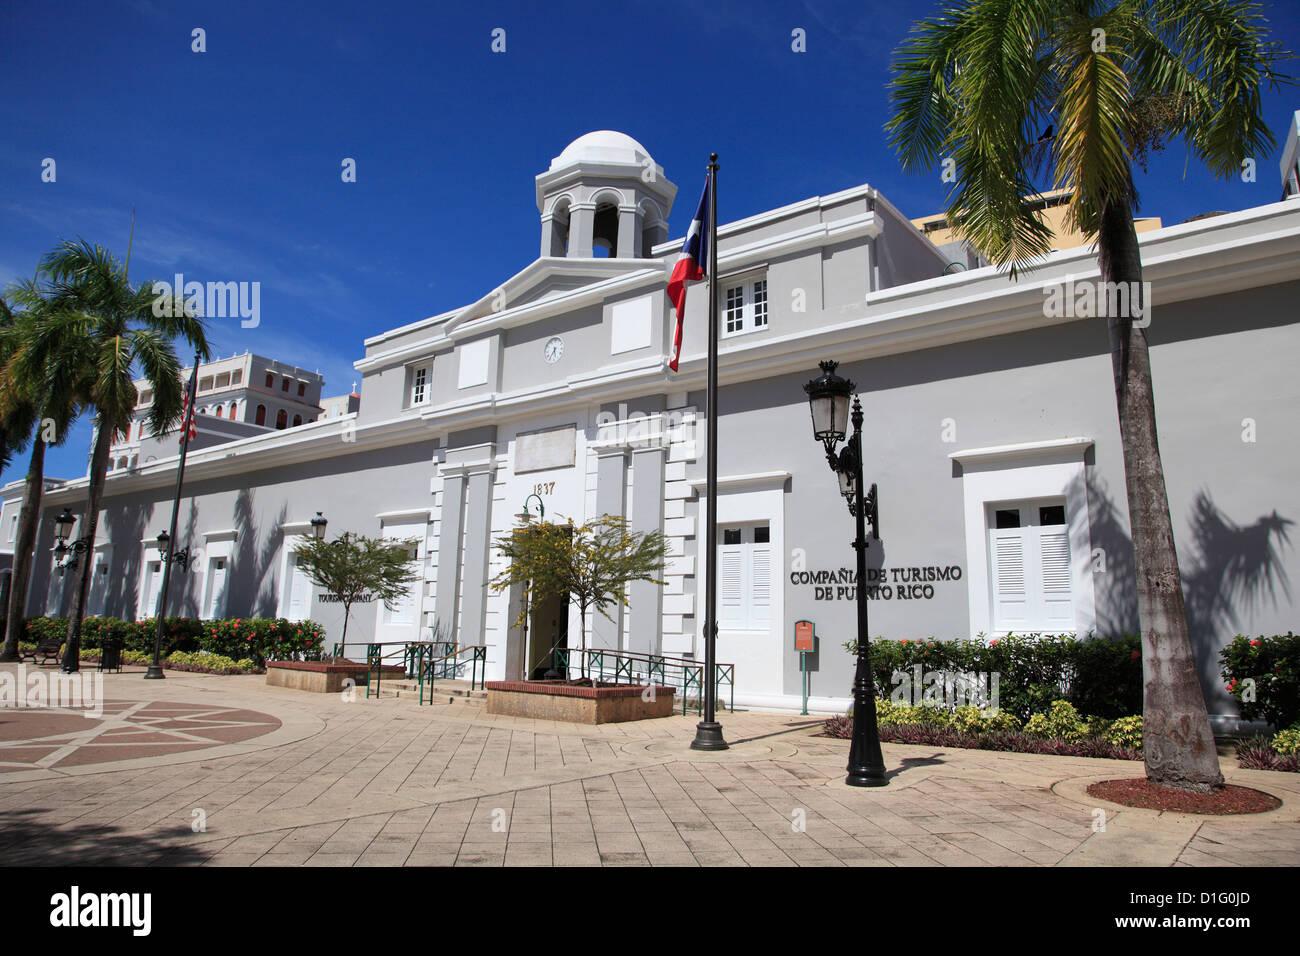 Museum, Puerto Rico Tourism Company, Paseo De La Princesa, Old San Juan, San Juan, Puerto Rico, West Indies Stockbild